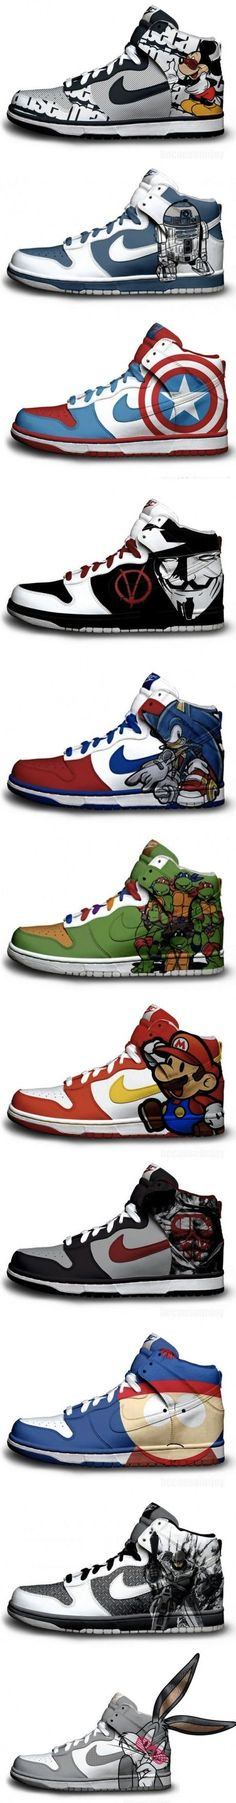 Shoe Designs Sneakers For Boys 5e518fb91